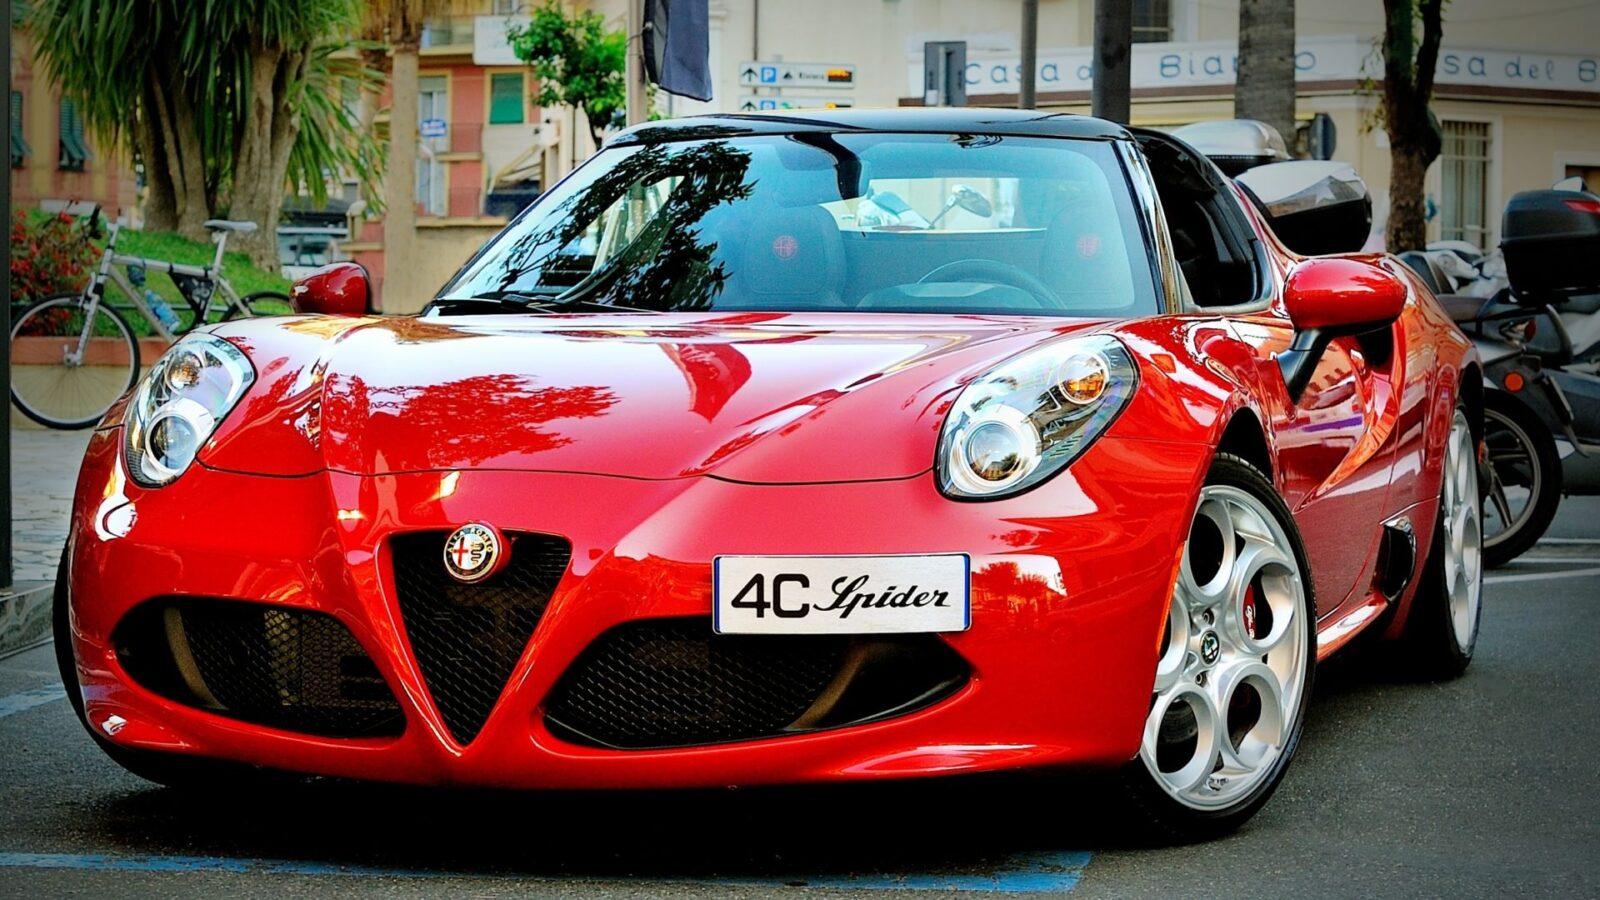 Alfa Romeo driving experience with Hotel Principe di Savoia